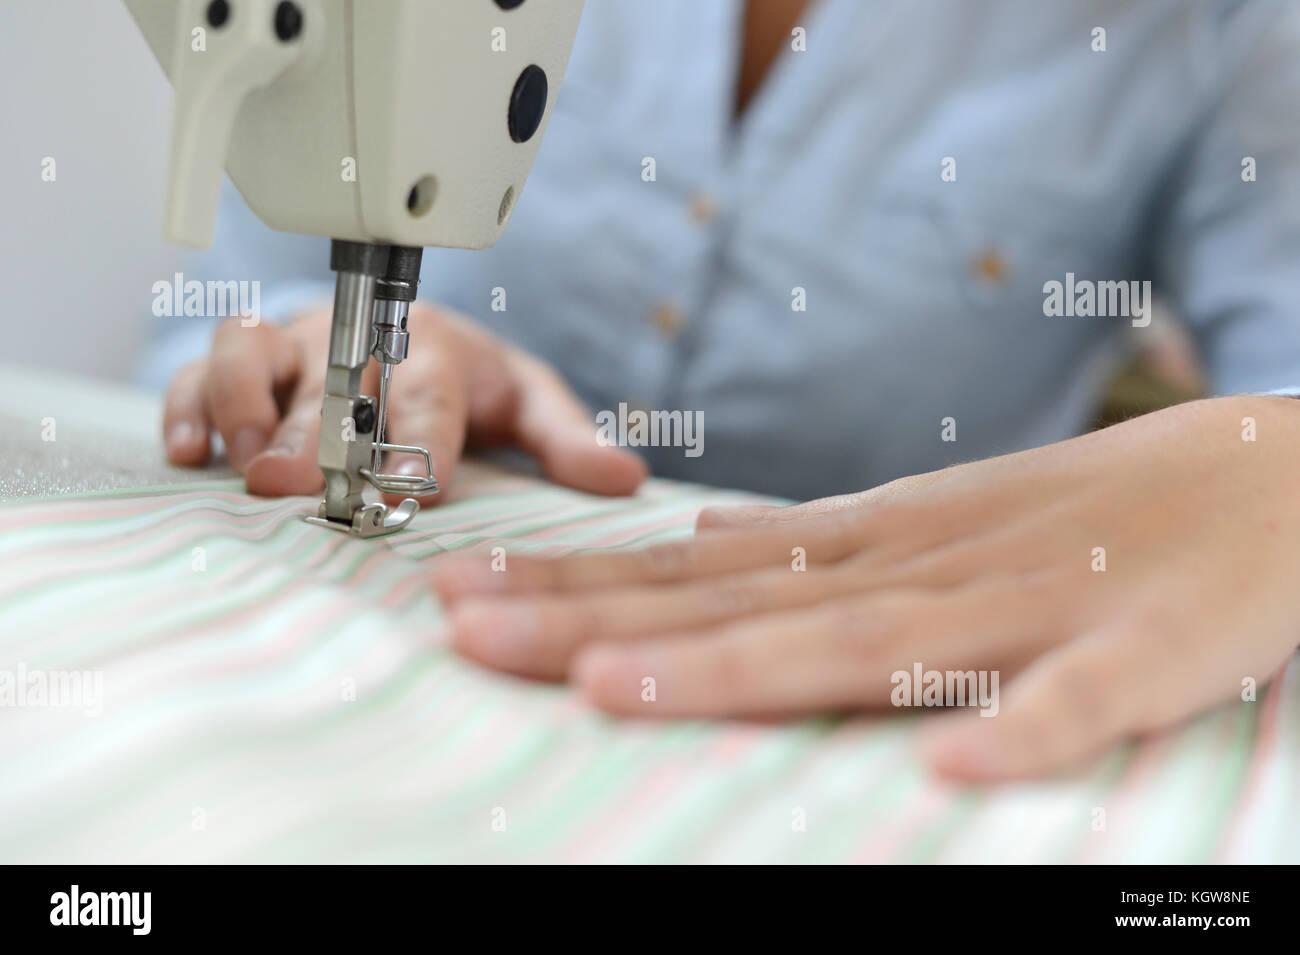 Closeup on dressmaker hand using sewing machine - Stock Image